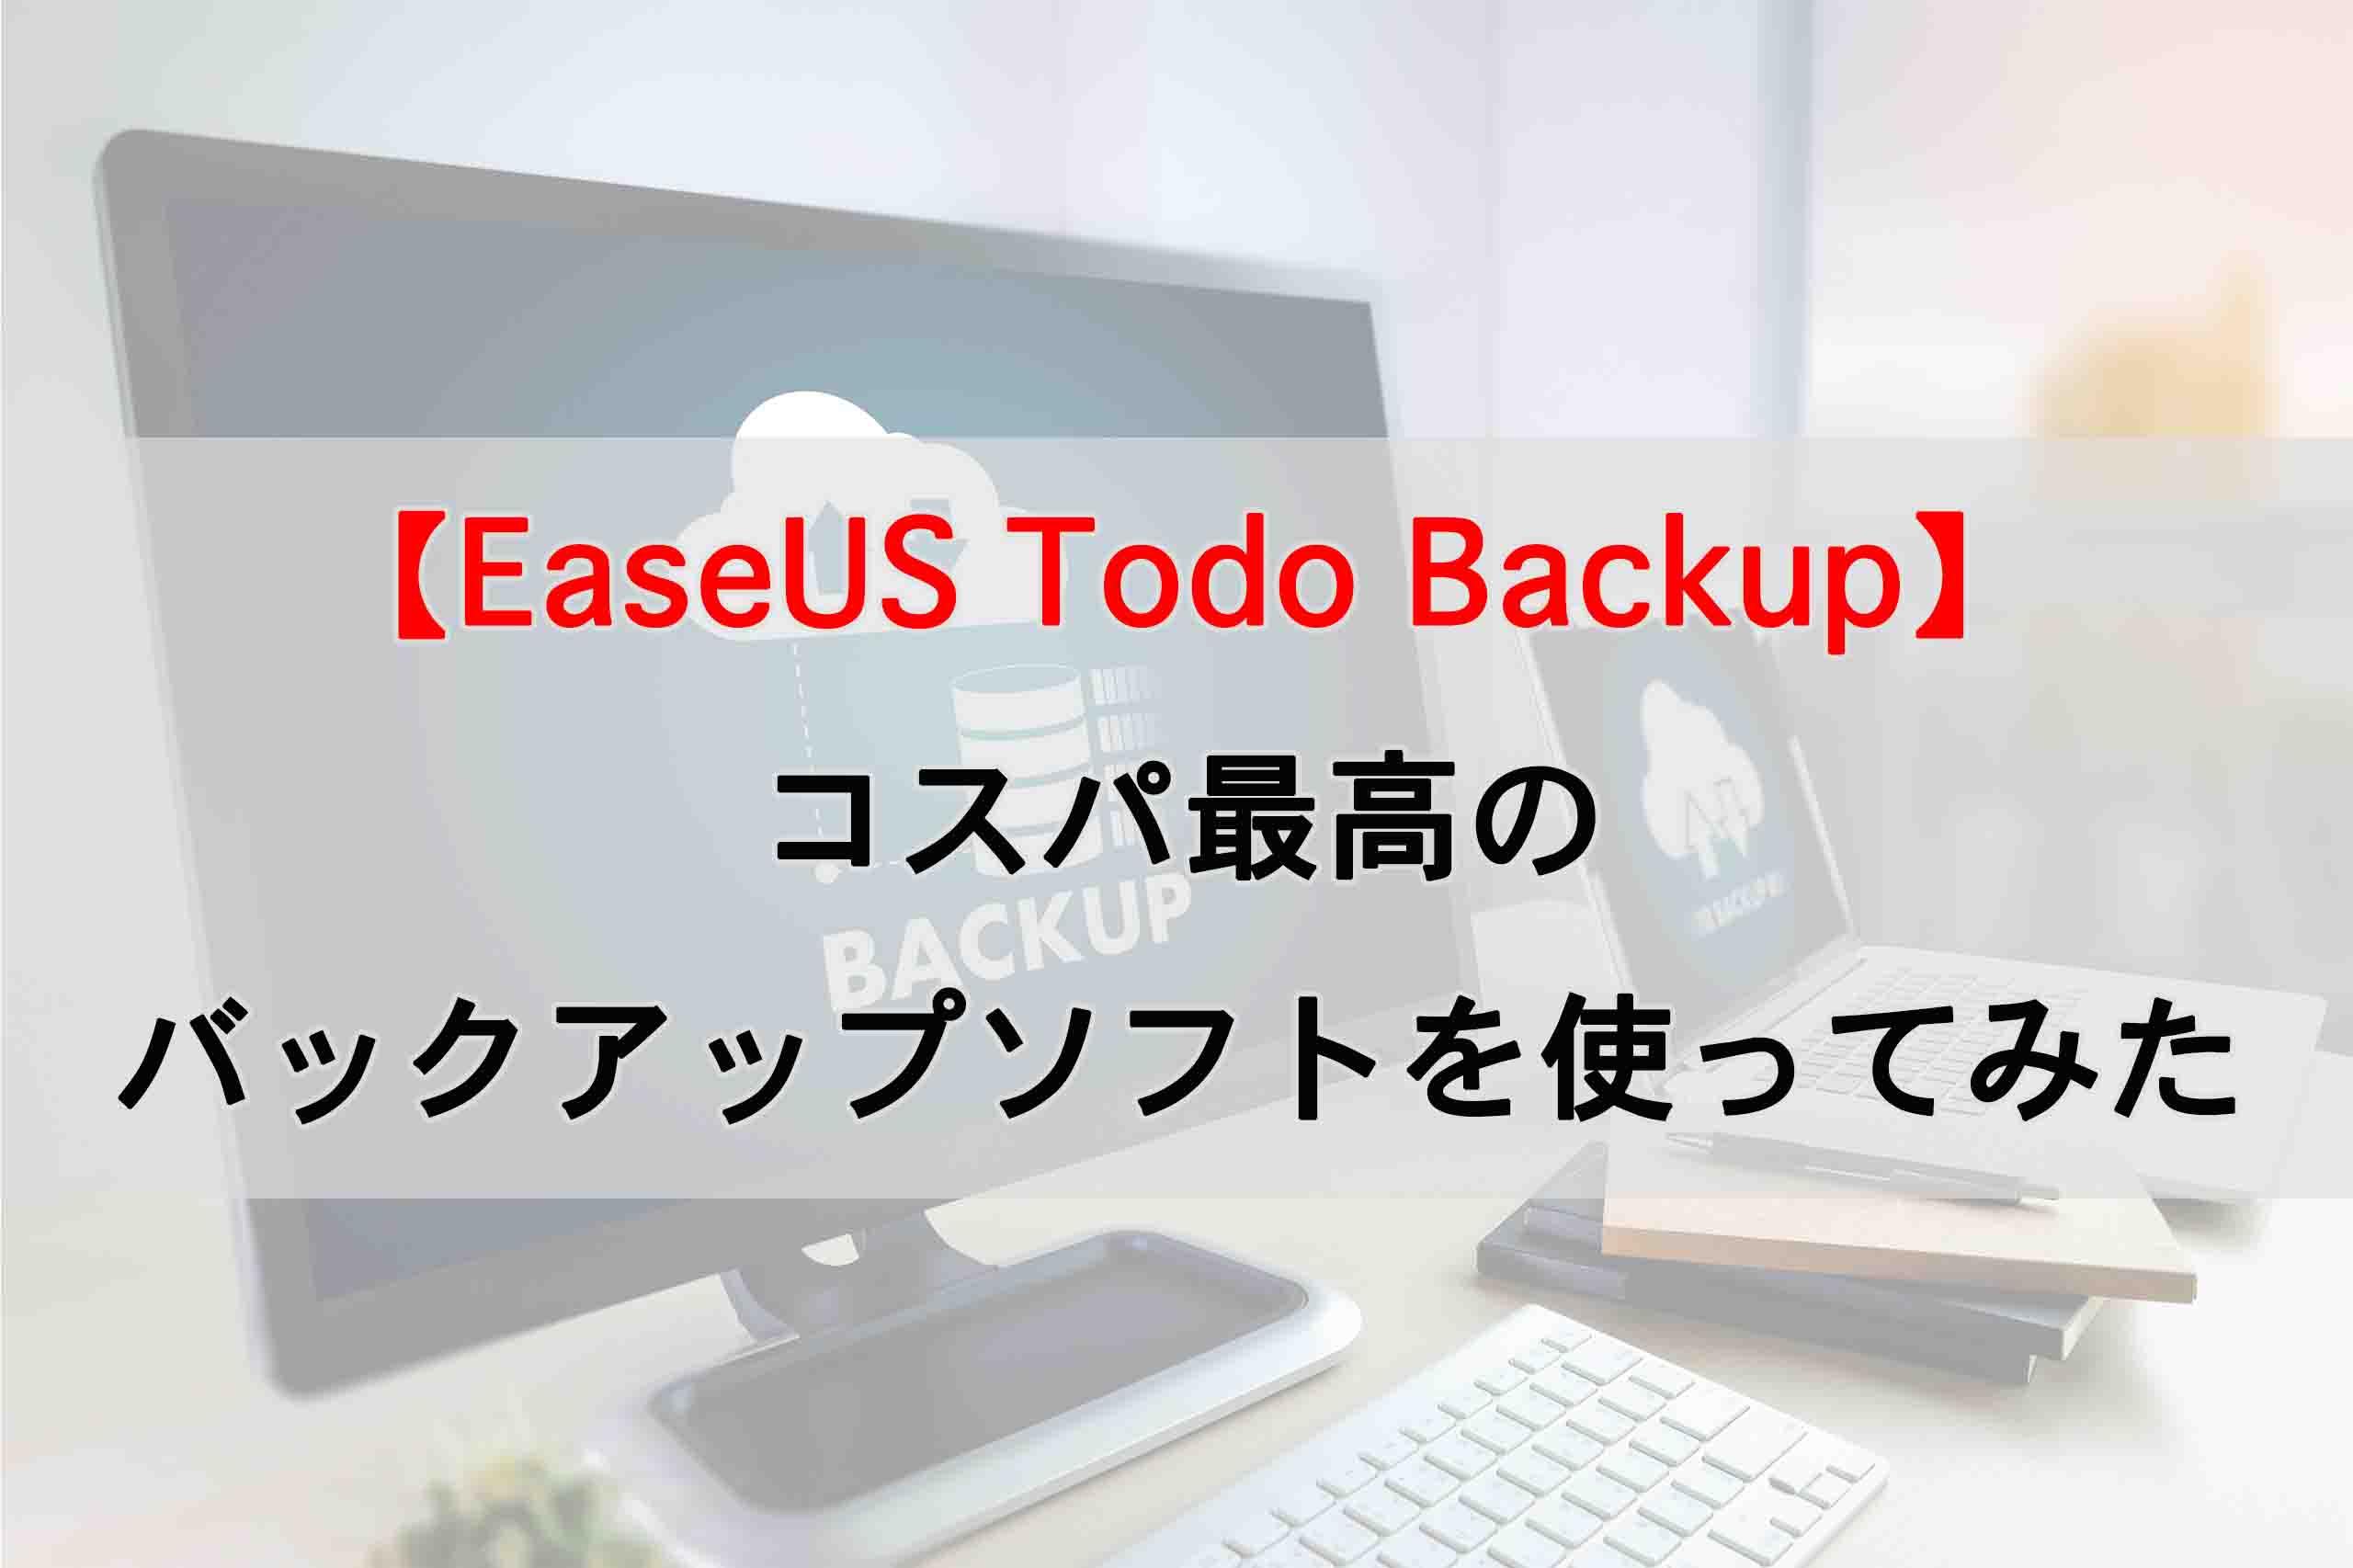 【EaseUS Todo Backup】コスパ最高のバックアップソフトを使ってみた